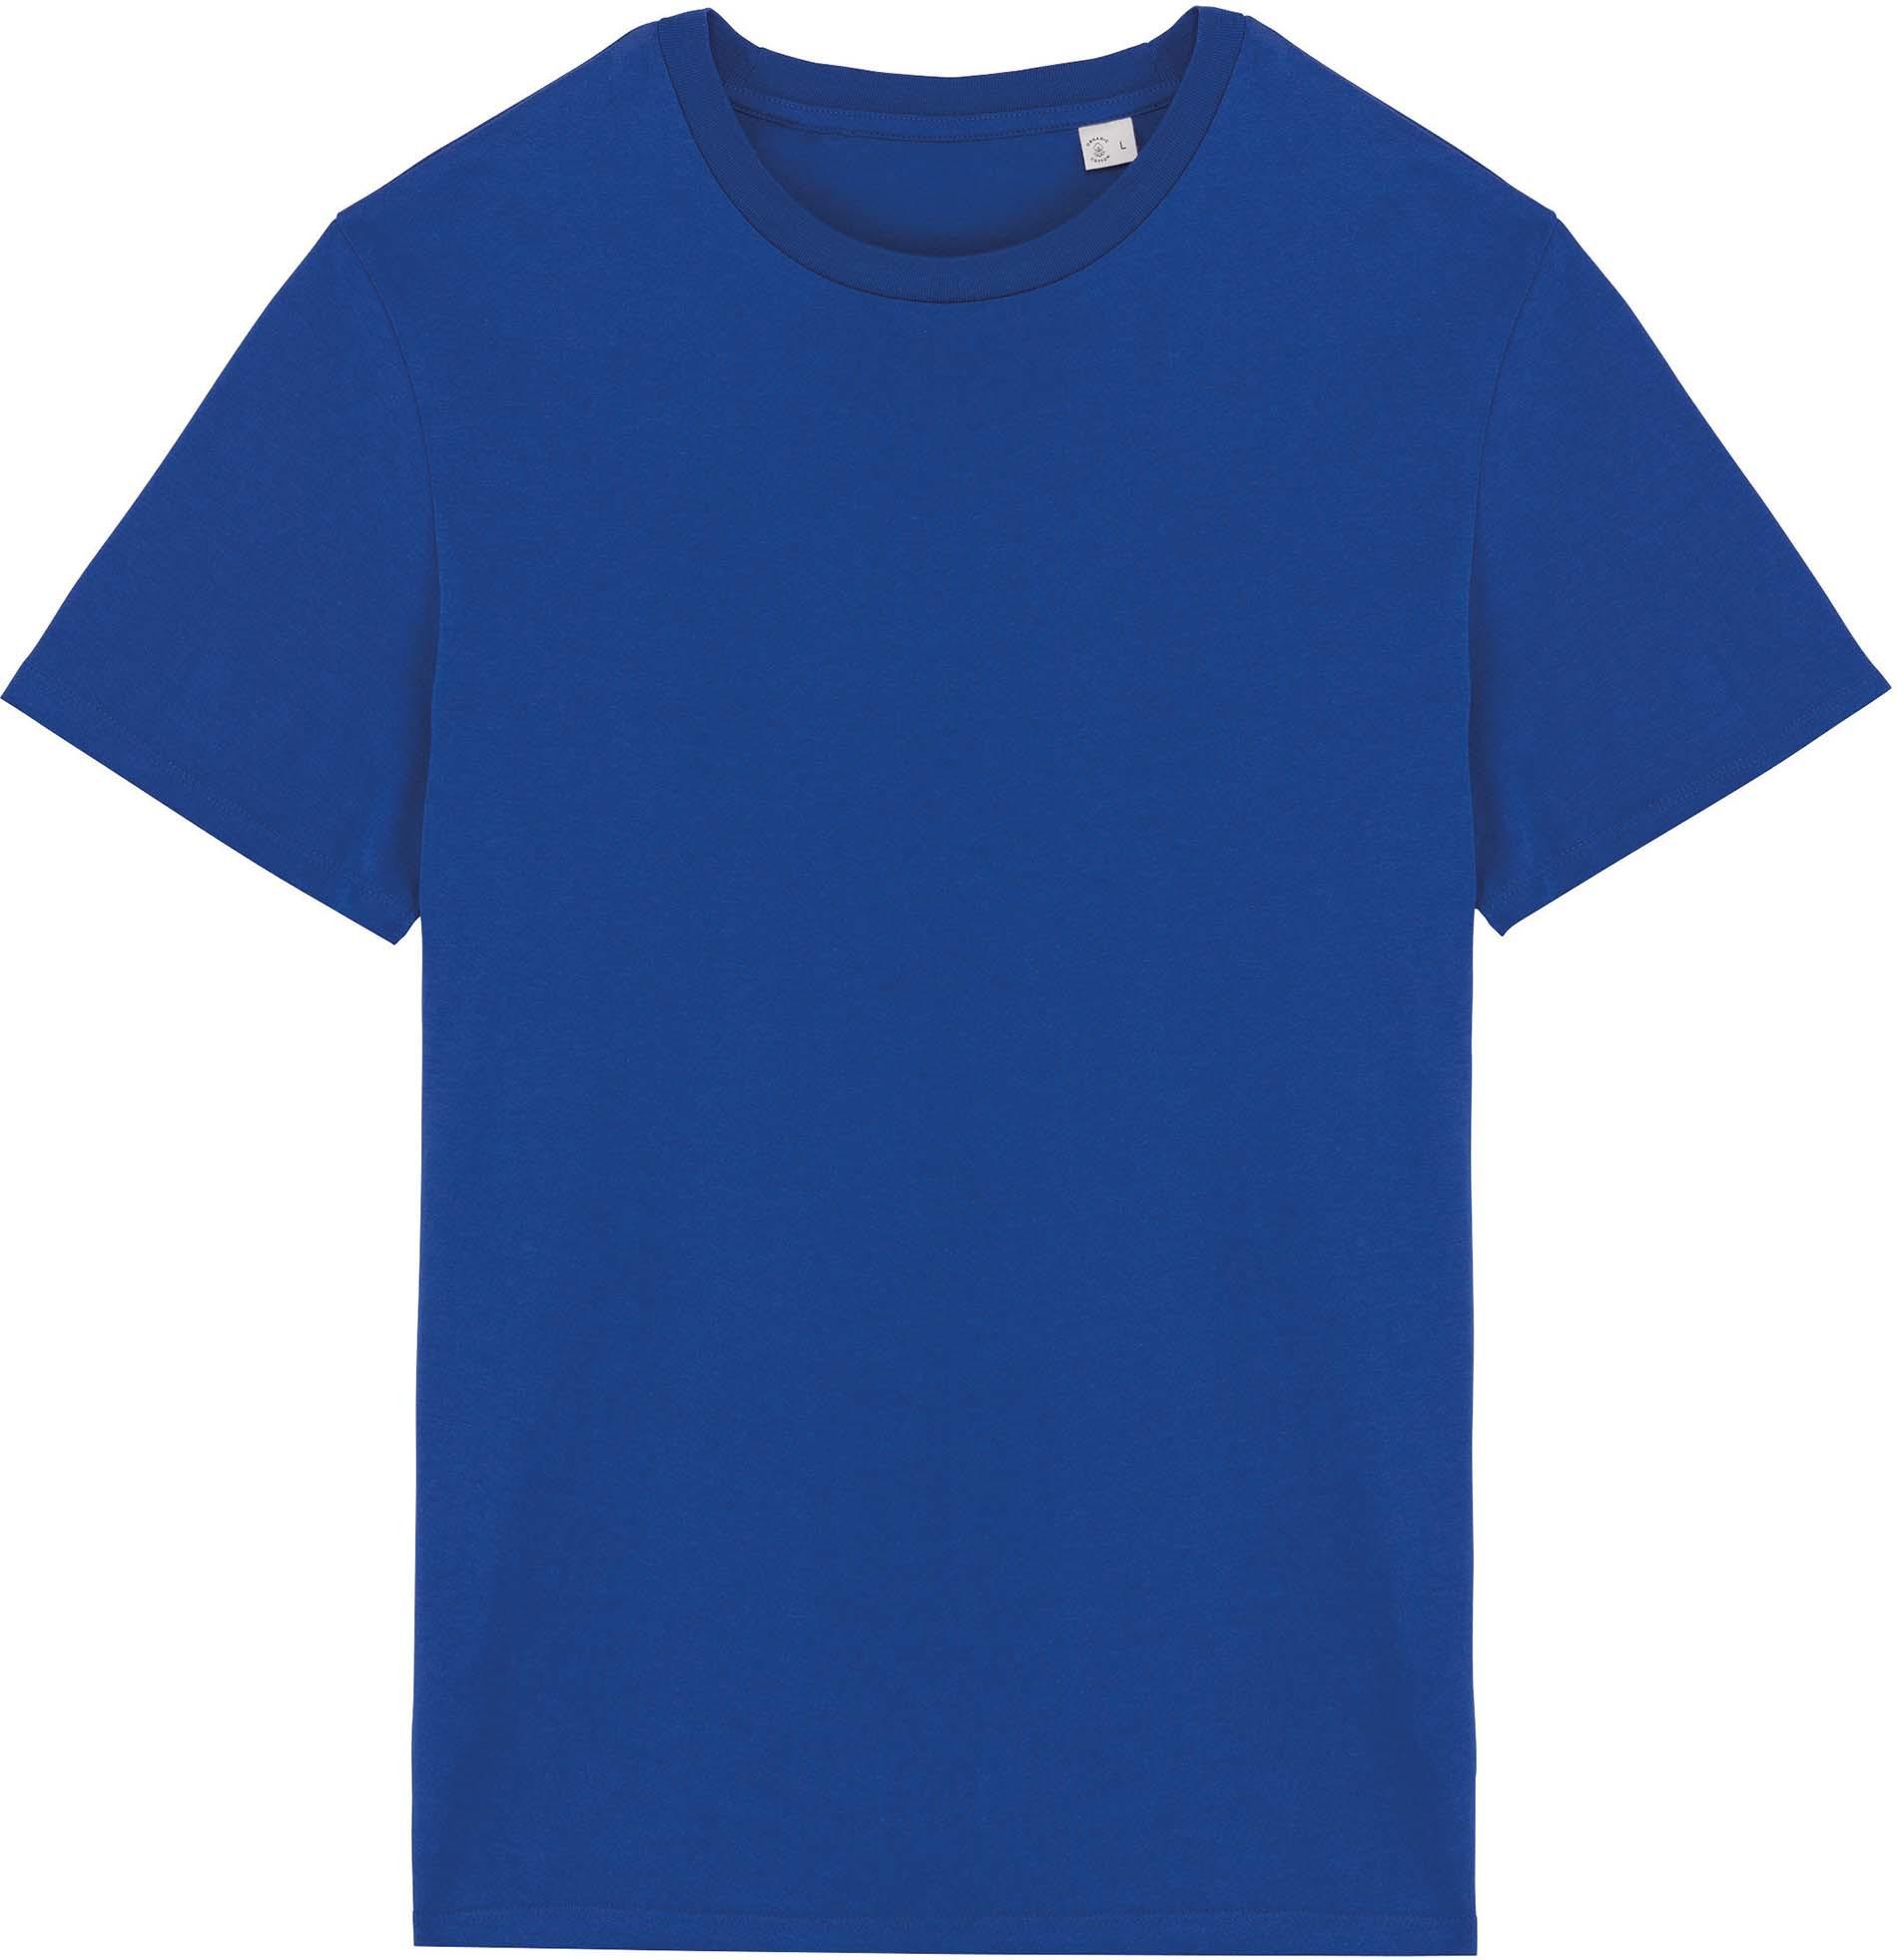 Tee-shirt manches courtes unisexe - 2-1843-31